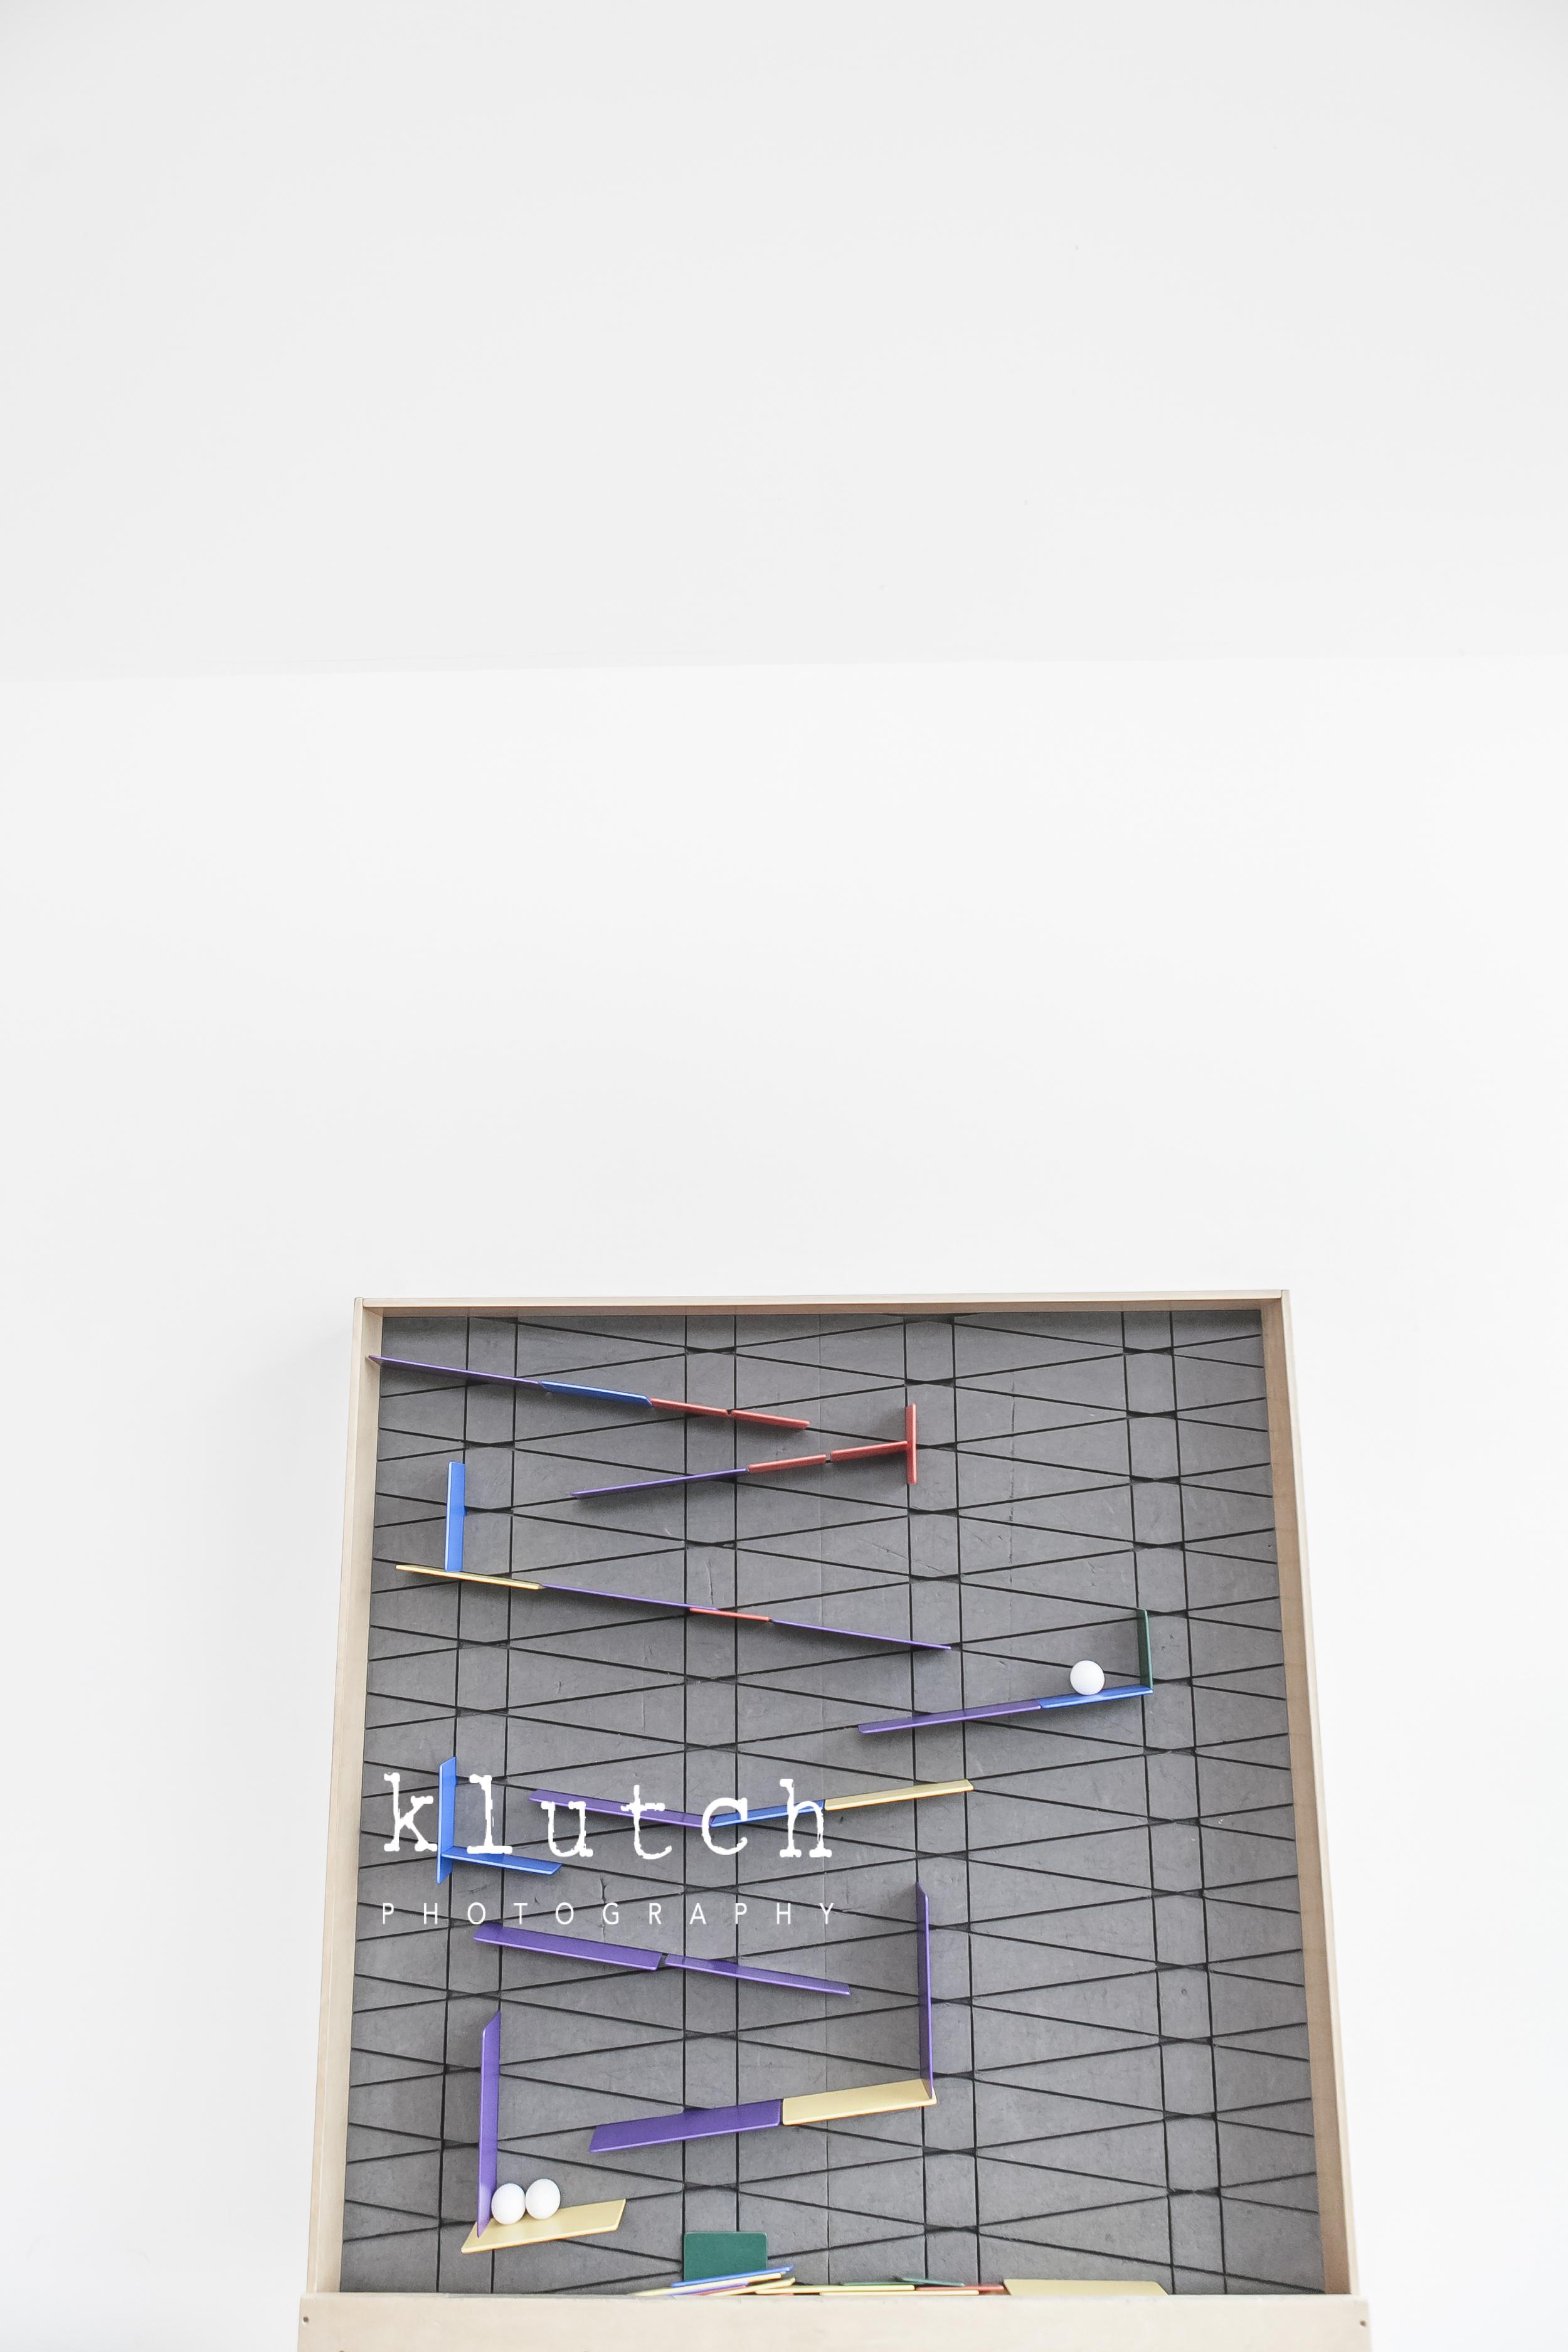 Klutch Photography,white rock family photographer, vancouver family photographer, whiterock lifestyle photographer, life unscripted photographer, life unscripted session, photography,Dina Ferreira Stoddard-9644.jpg